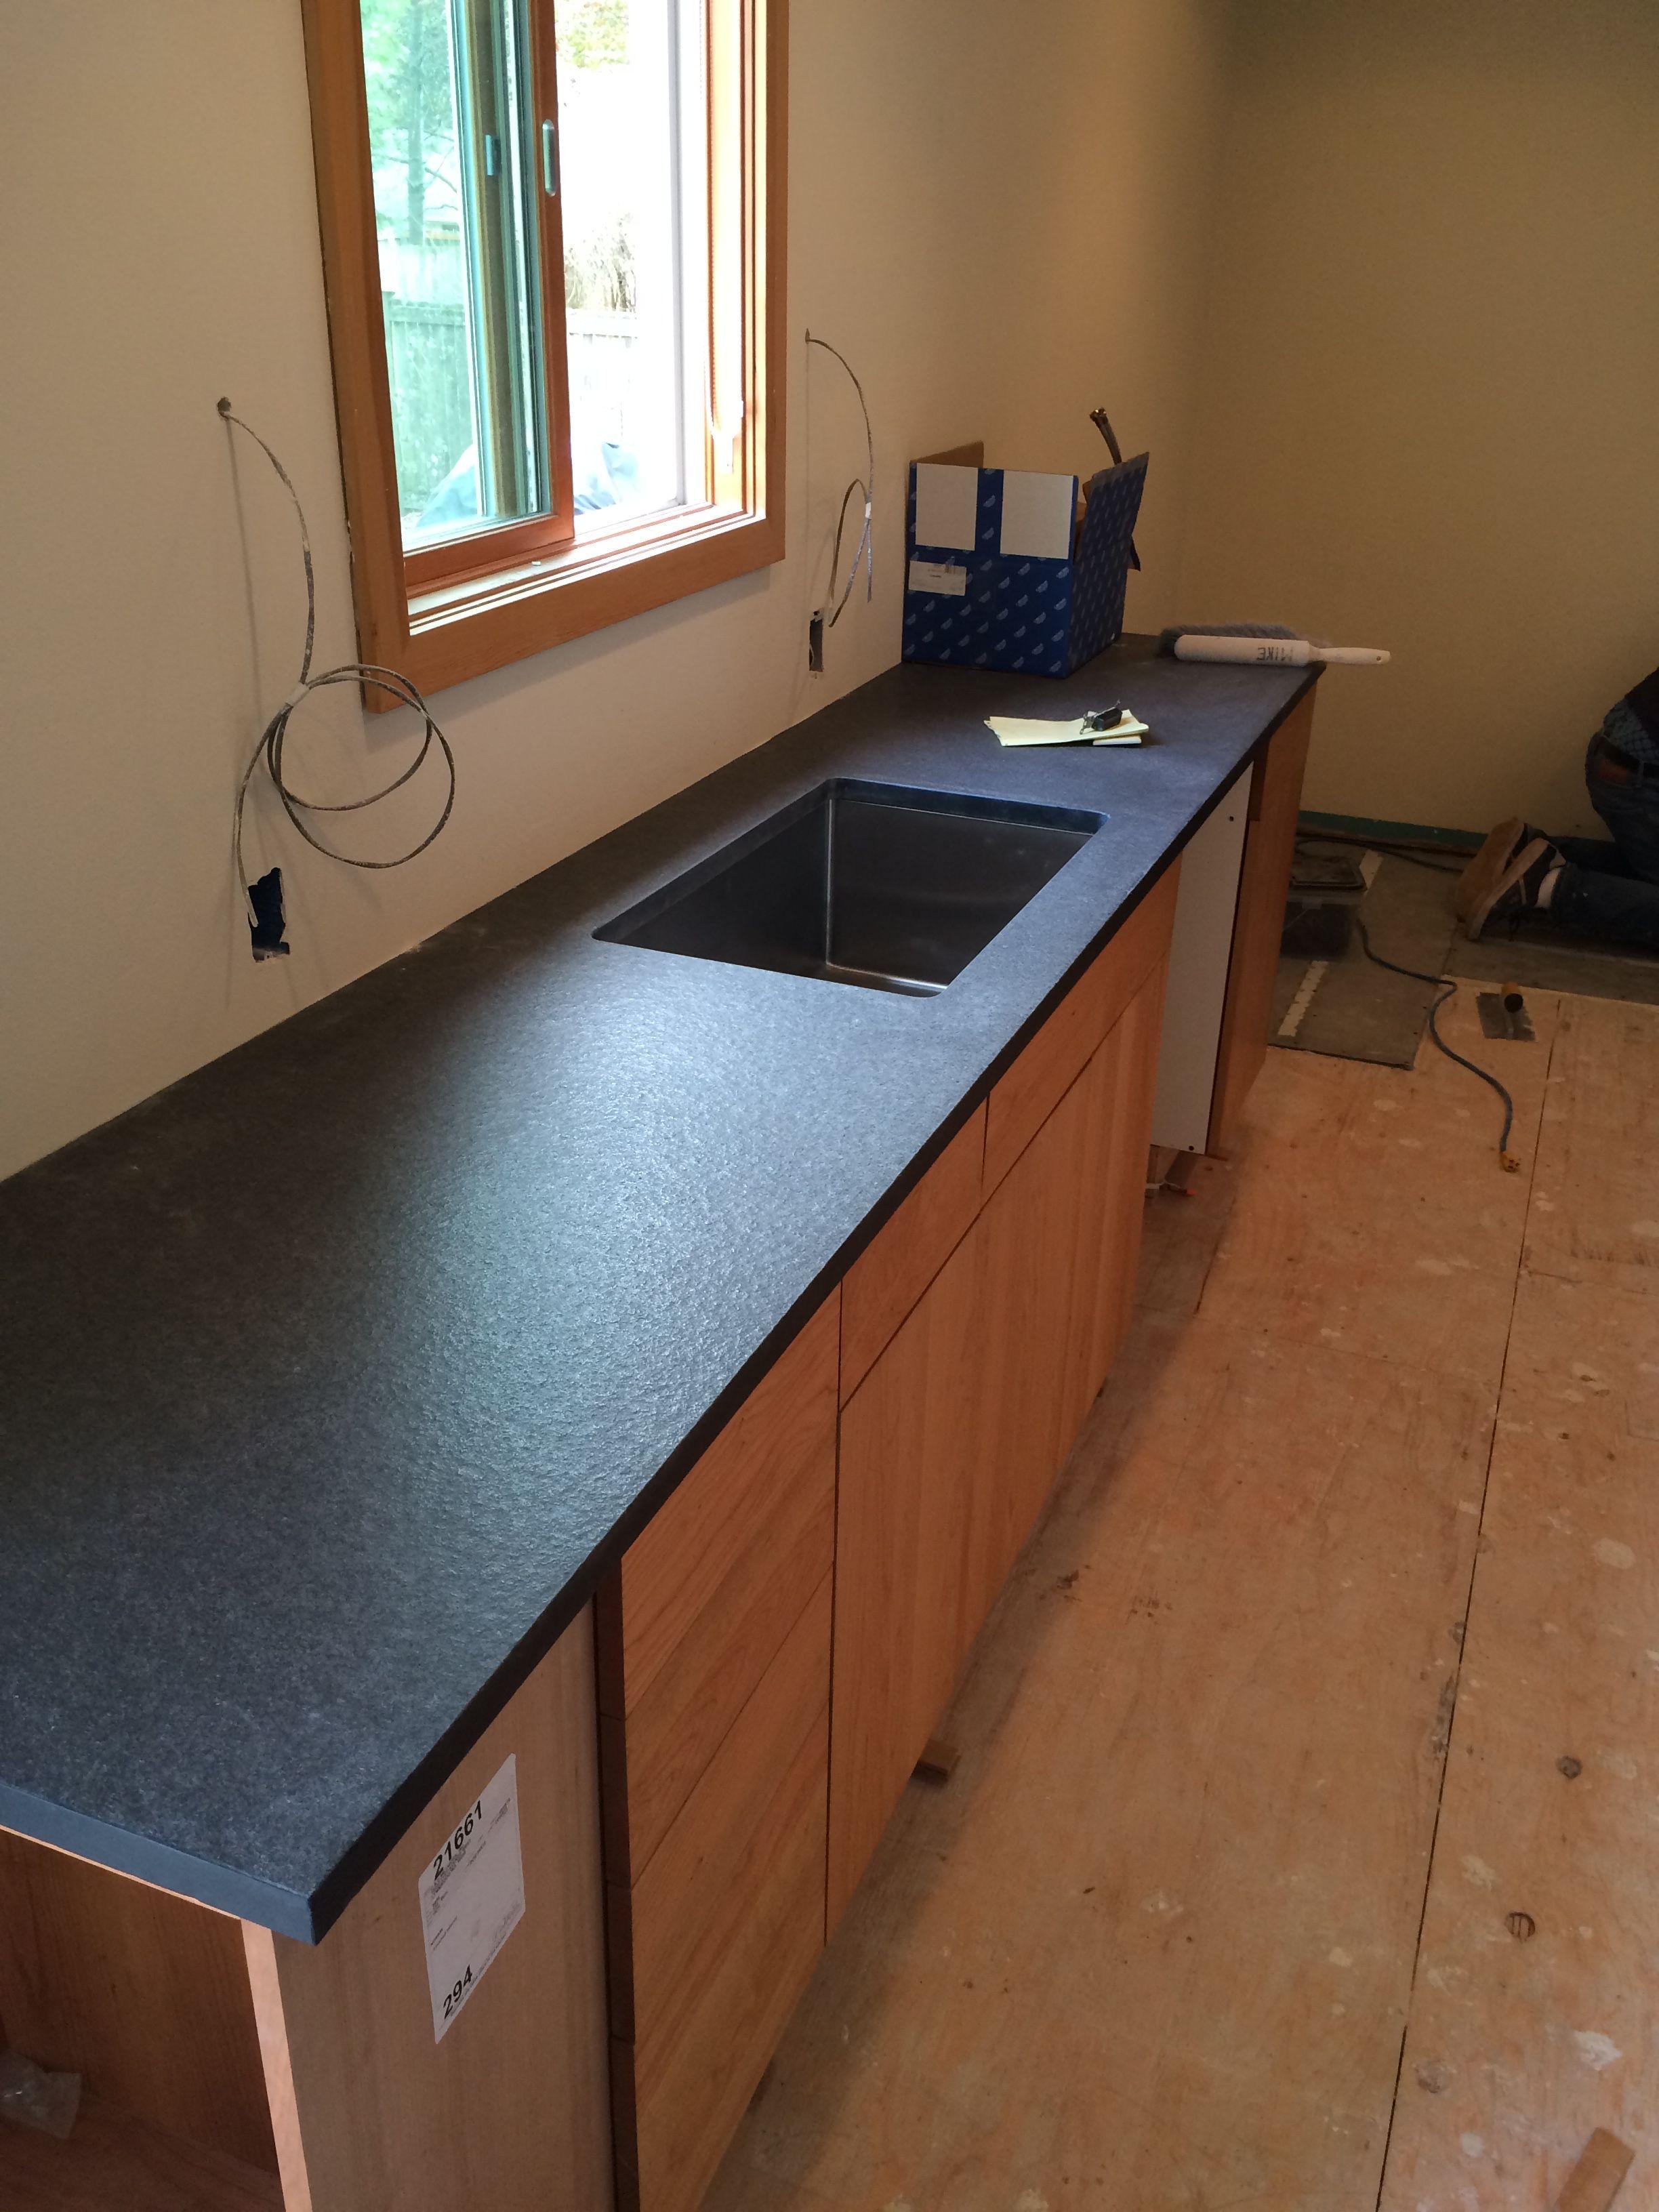 Absolute Black Granite In Anticado Leathered Finish Dewils Capella Cabinets In Natural C Granite Kitchen Island Leather Granite Granite Bathroom Countertops